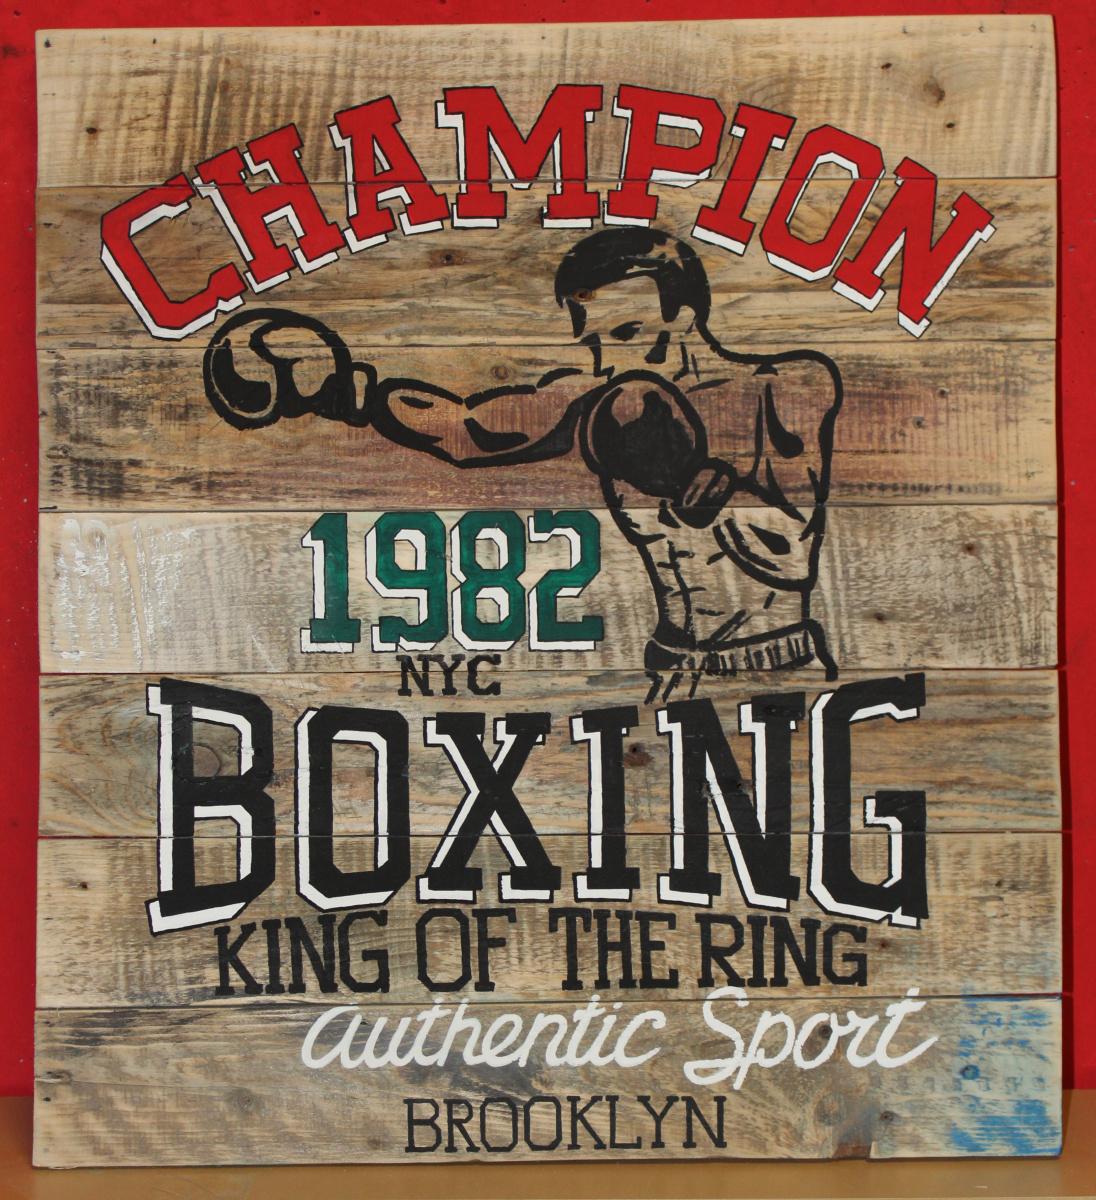 Michael Earthman. Champion